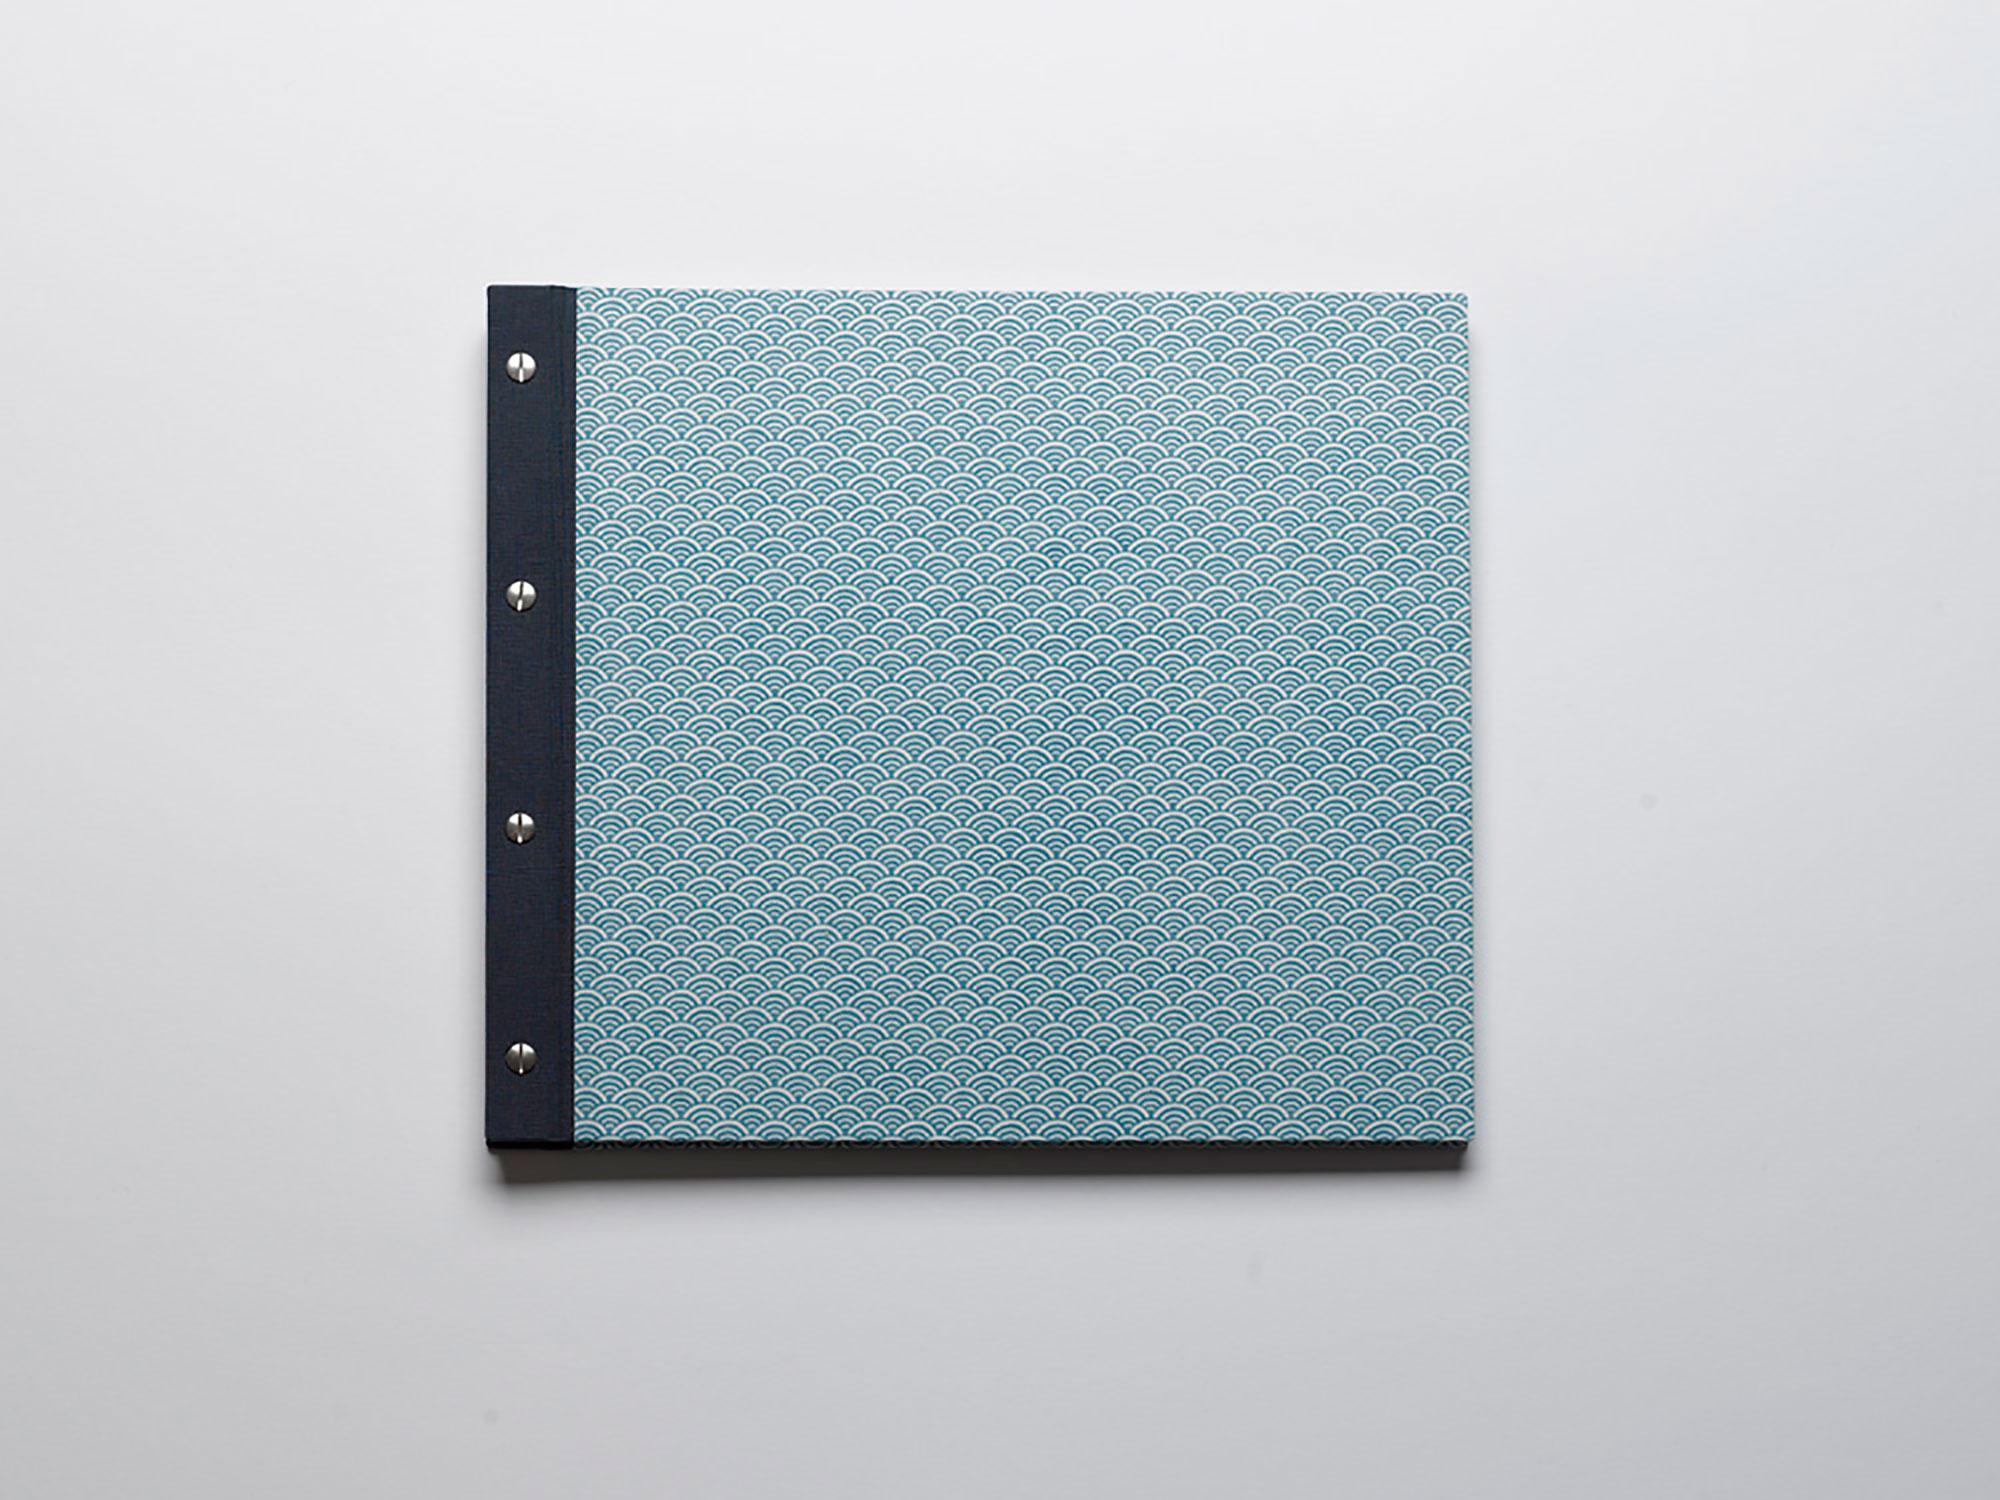 Fotoalbum, eingebunden in Chiyogami-Papier